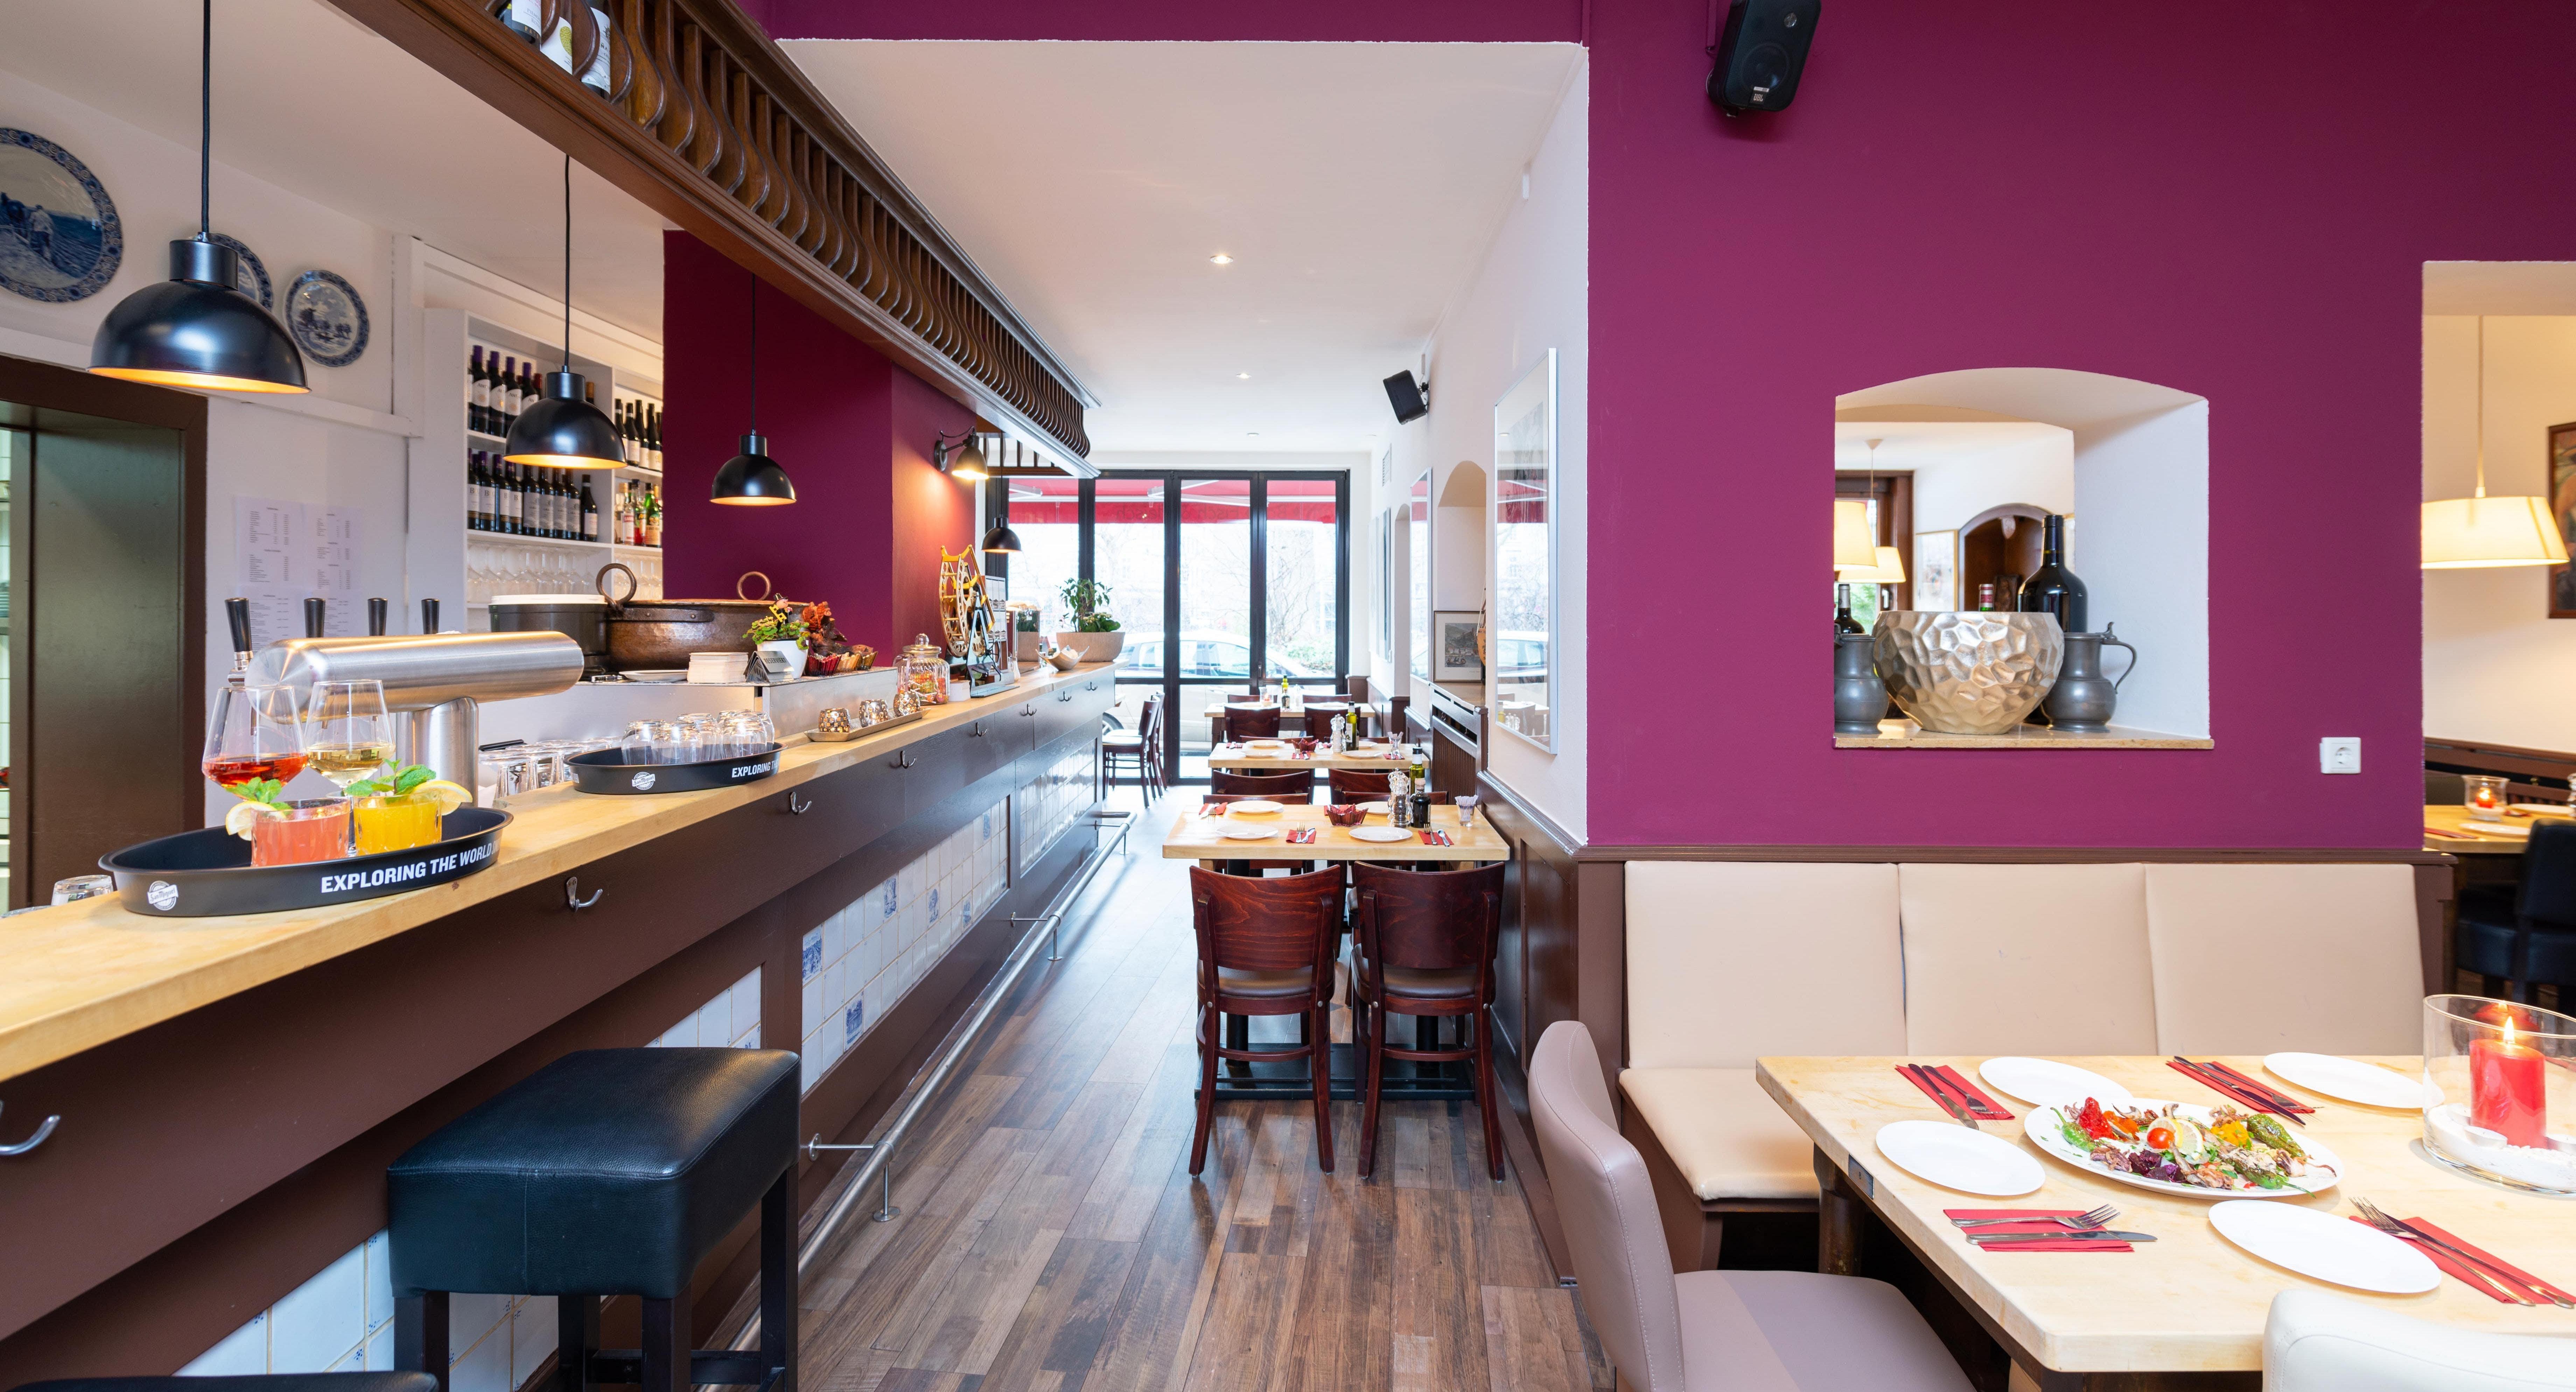 Saban's Cafe & Restaurant Düsseldorf image 2